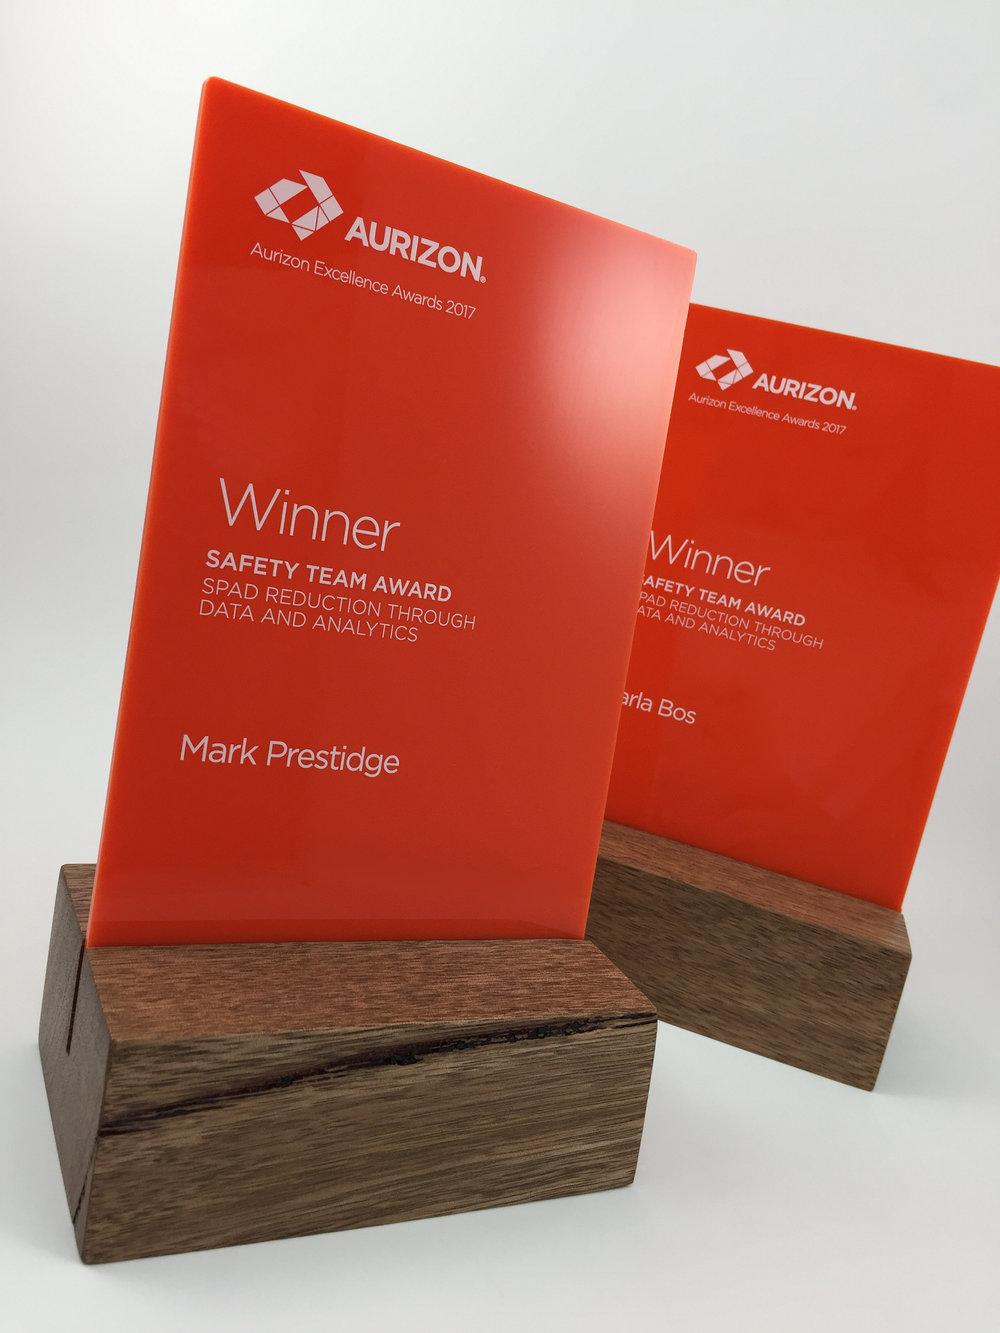 aurizon-acrylic-wood-corporate-trophy-award-02.jpg